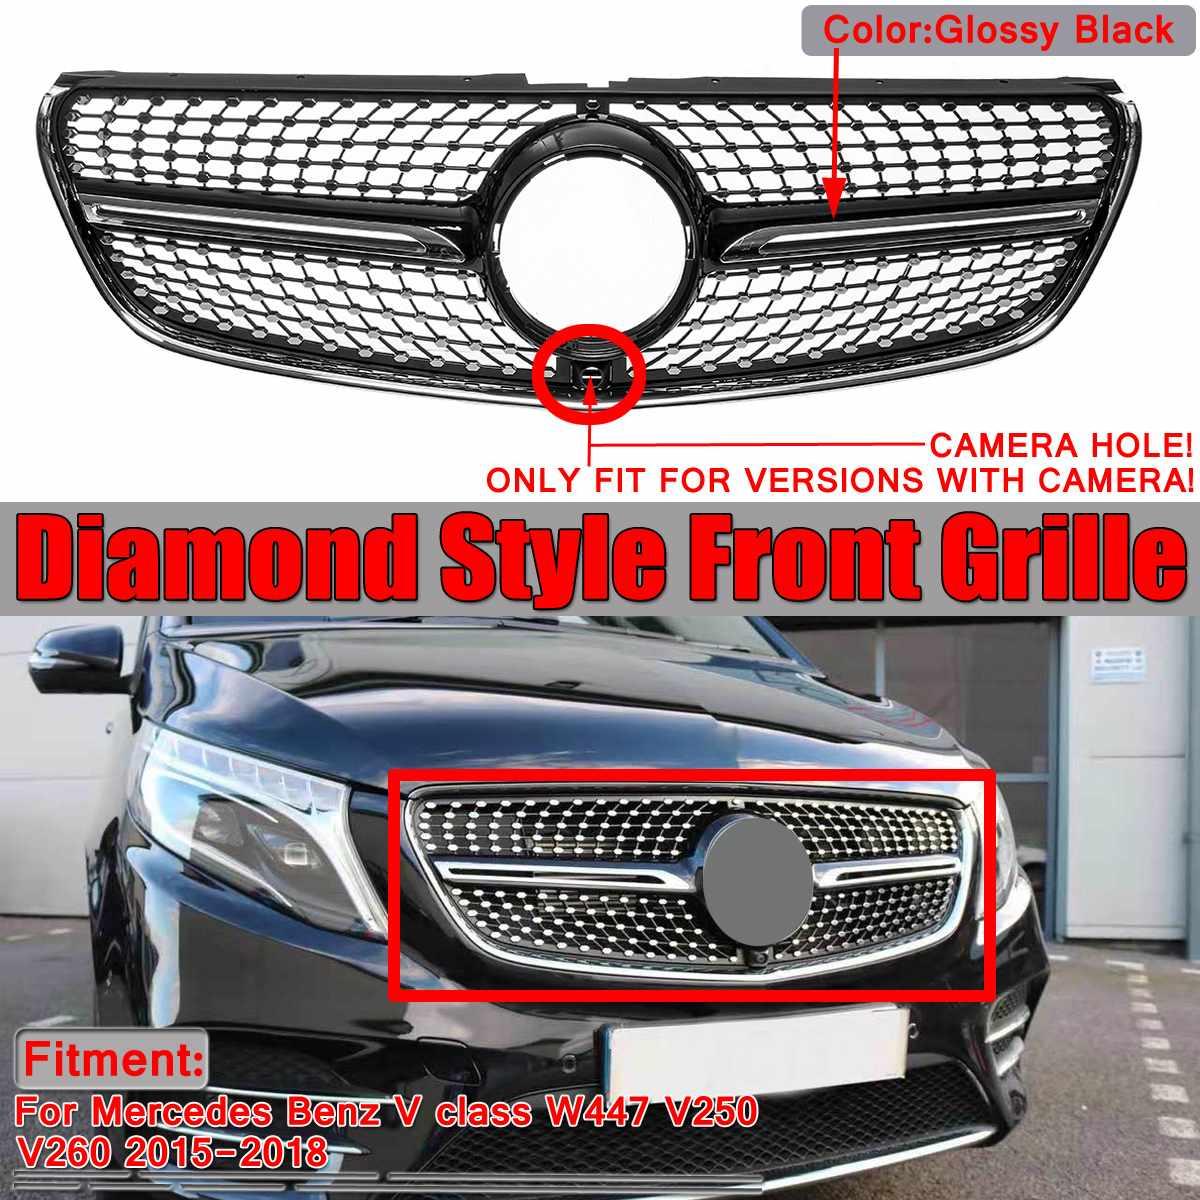 Diamant Grill Mesh W447 Auto Kühlergrill Grill Mit Kamera Für Mercedes Für Benz V Klasse W447 V250 V260 2015 -2018 Schwarz/Chrom